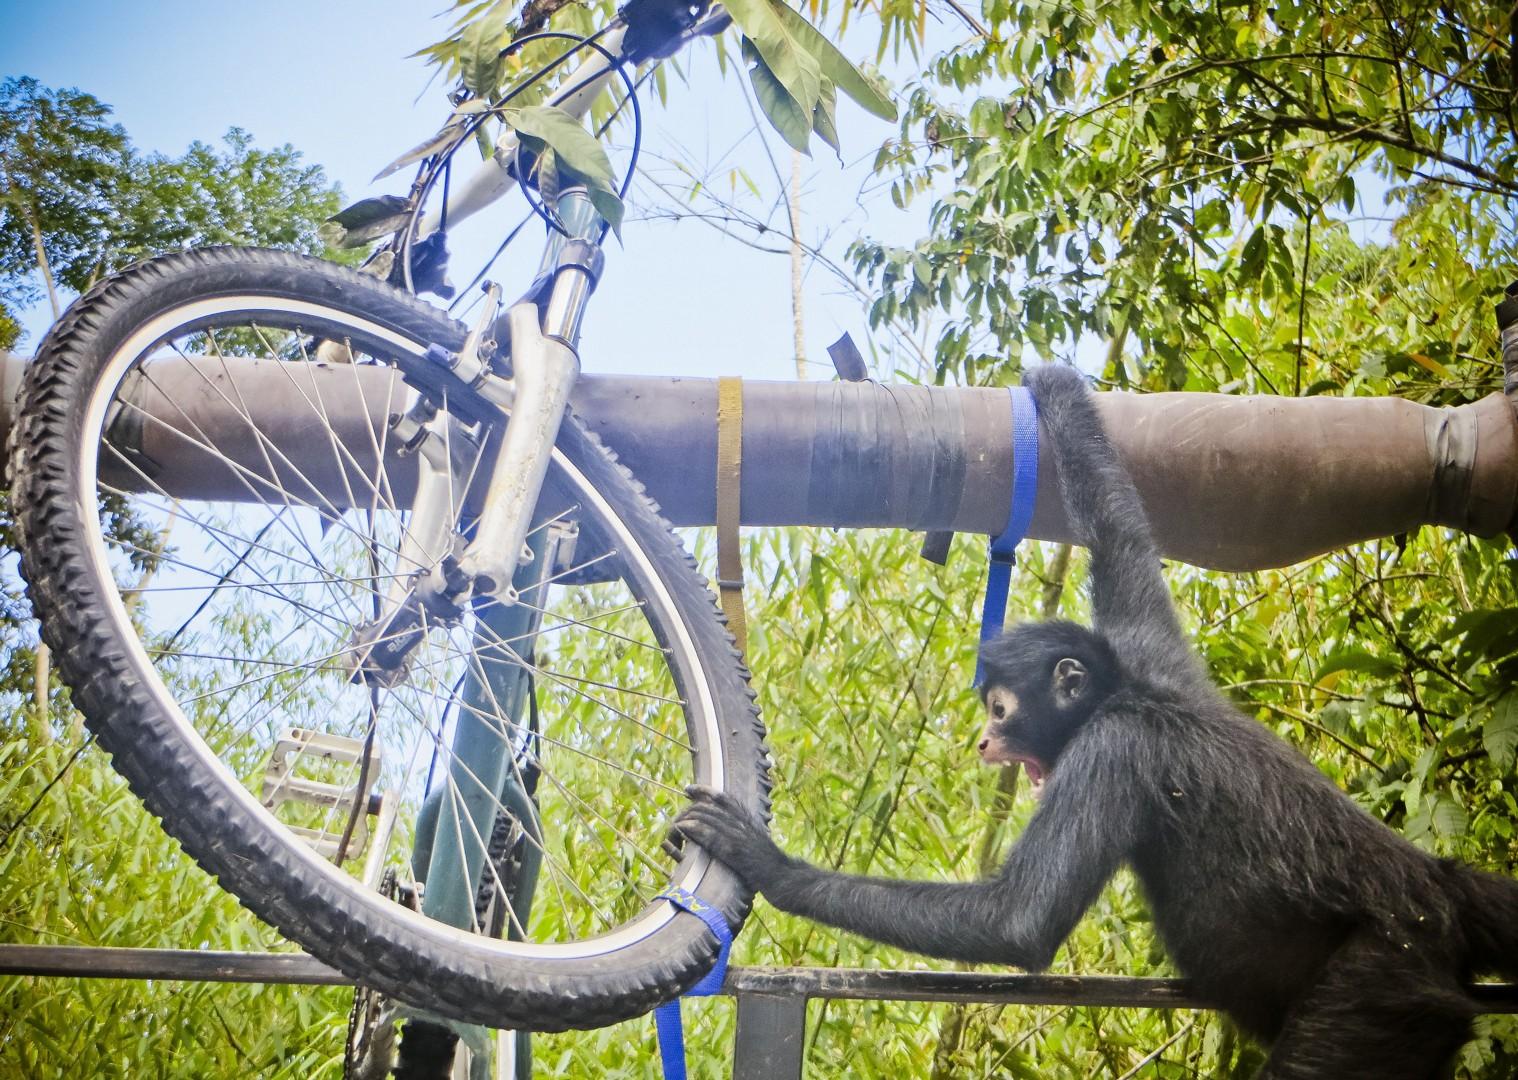 150424_Bike to Manu_46.jpg - Peru - Andes, Amazon and Machu Picchu - Cycling Adventures